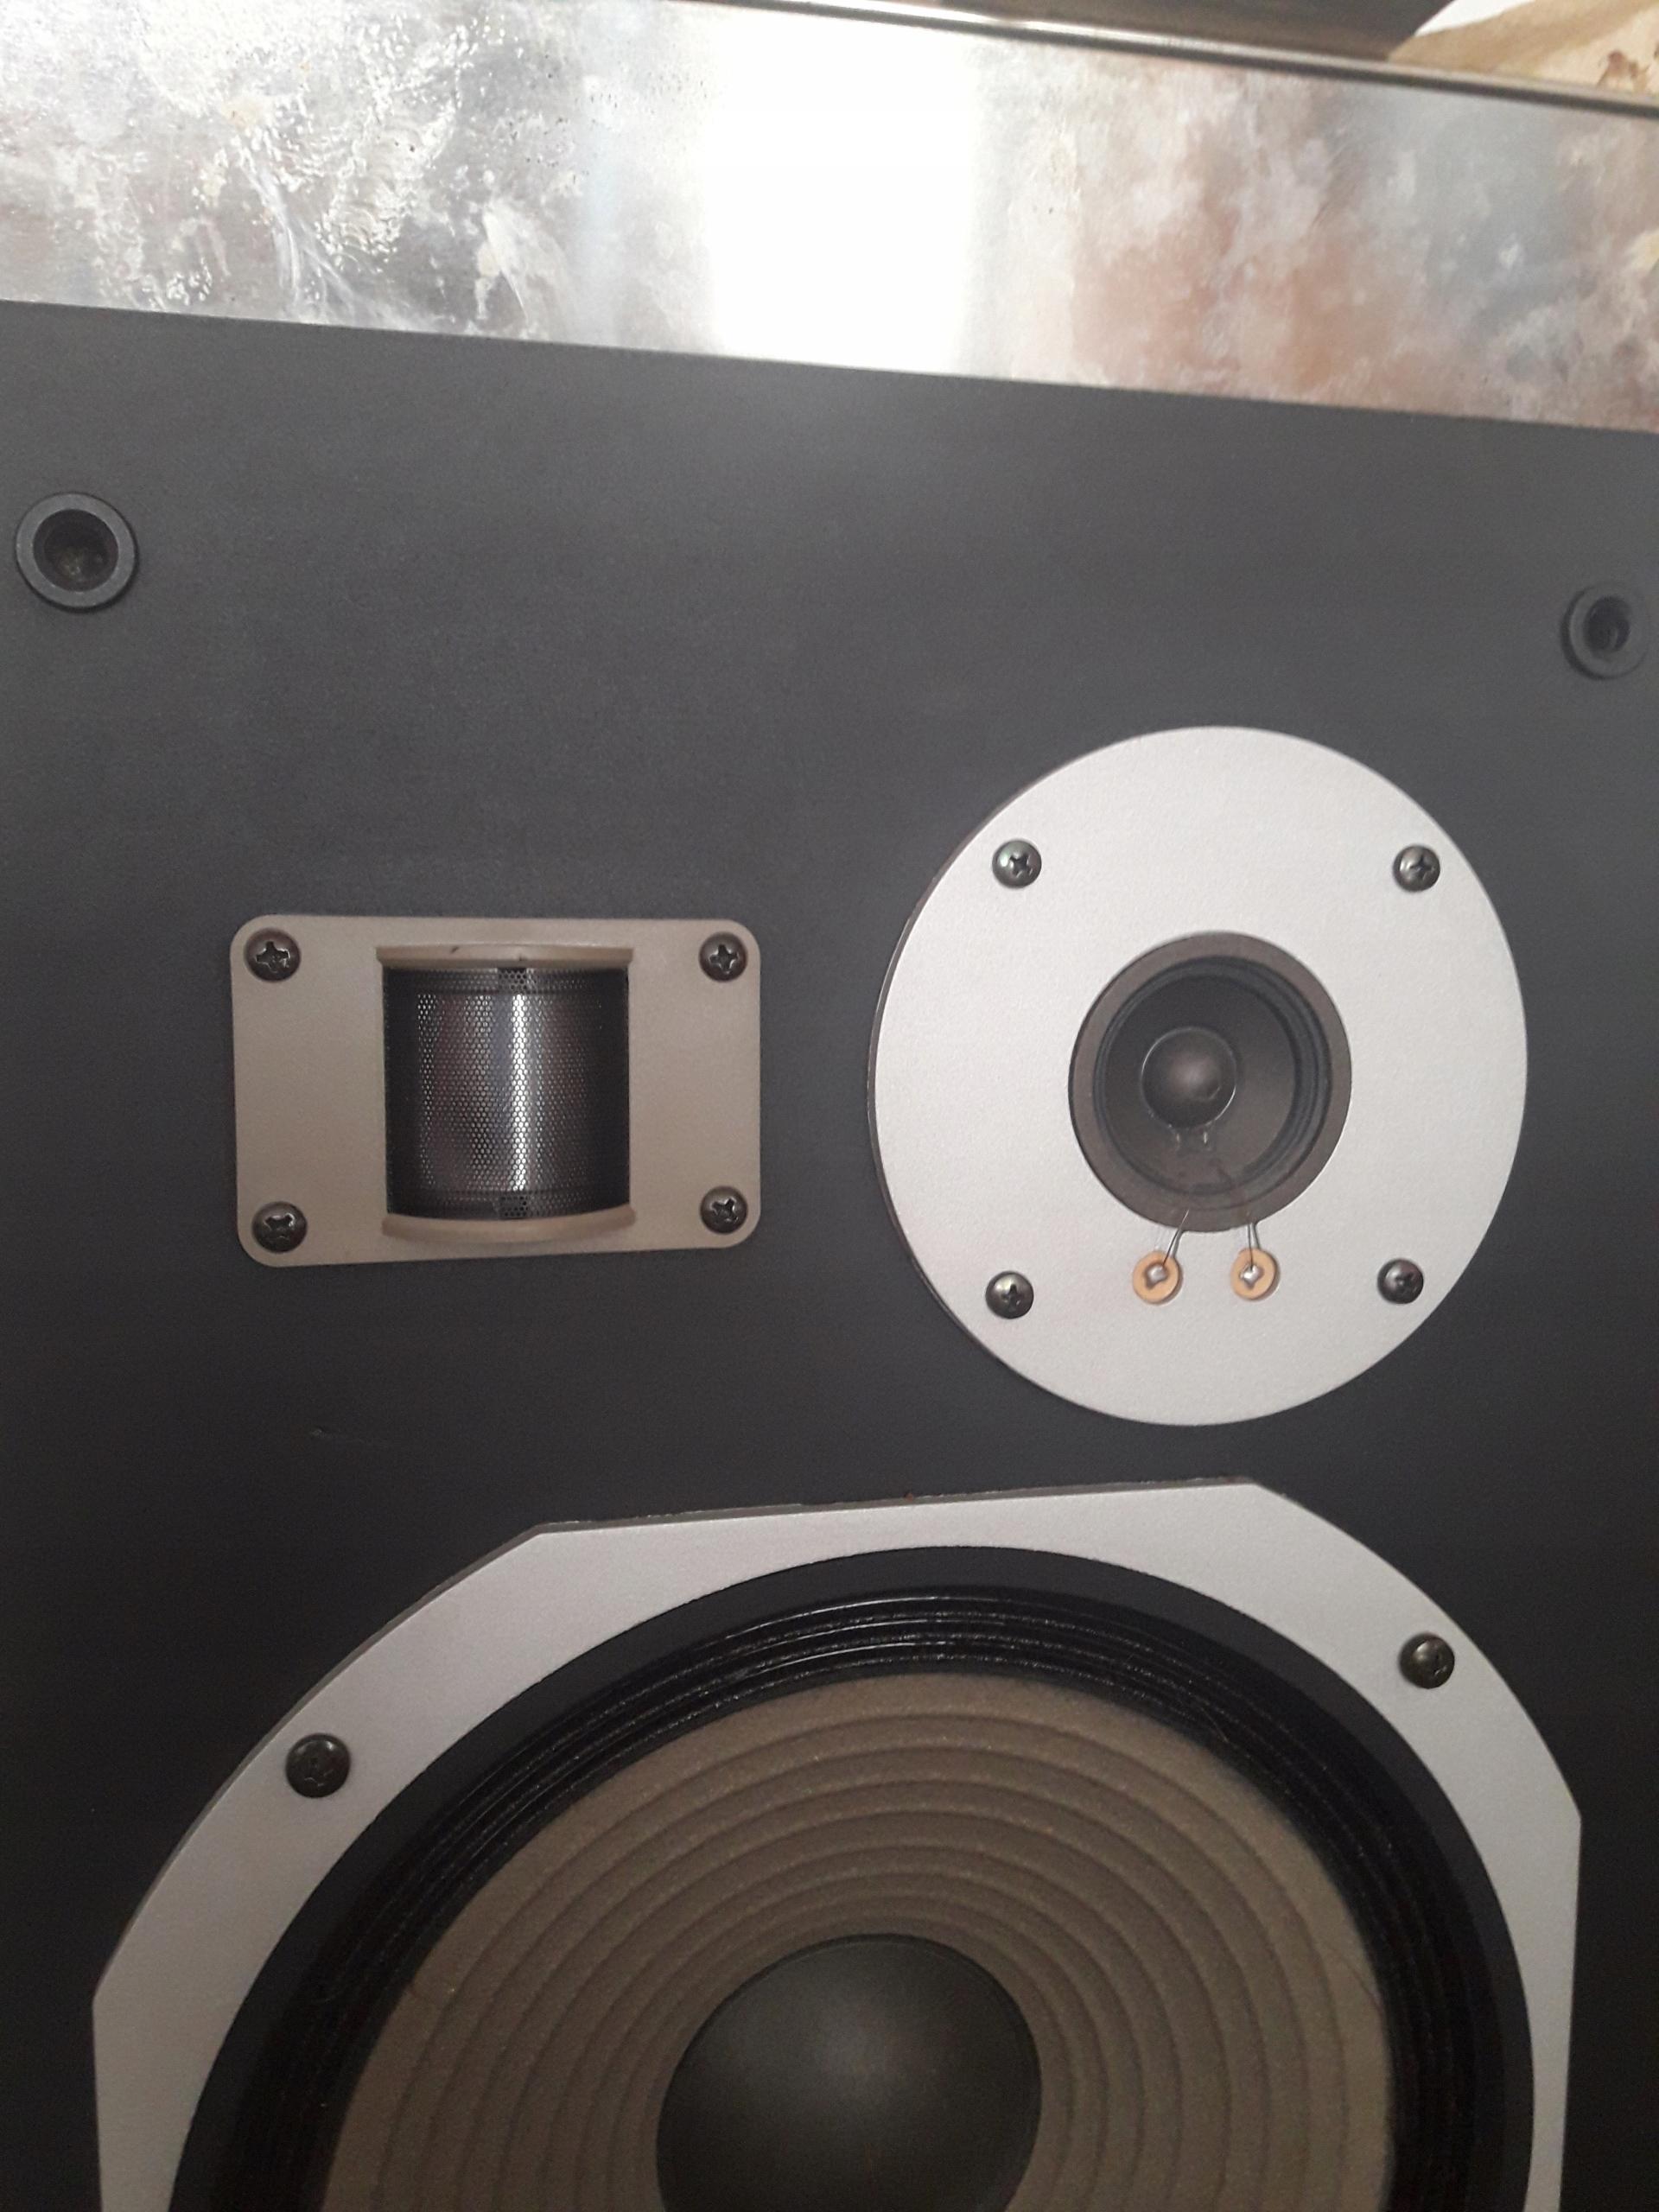 Pioneer Hpm hp 015 Wstęga